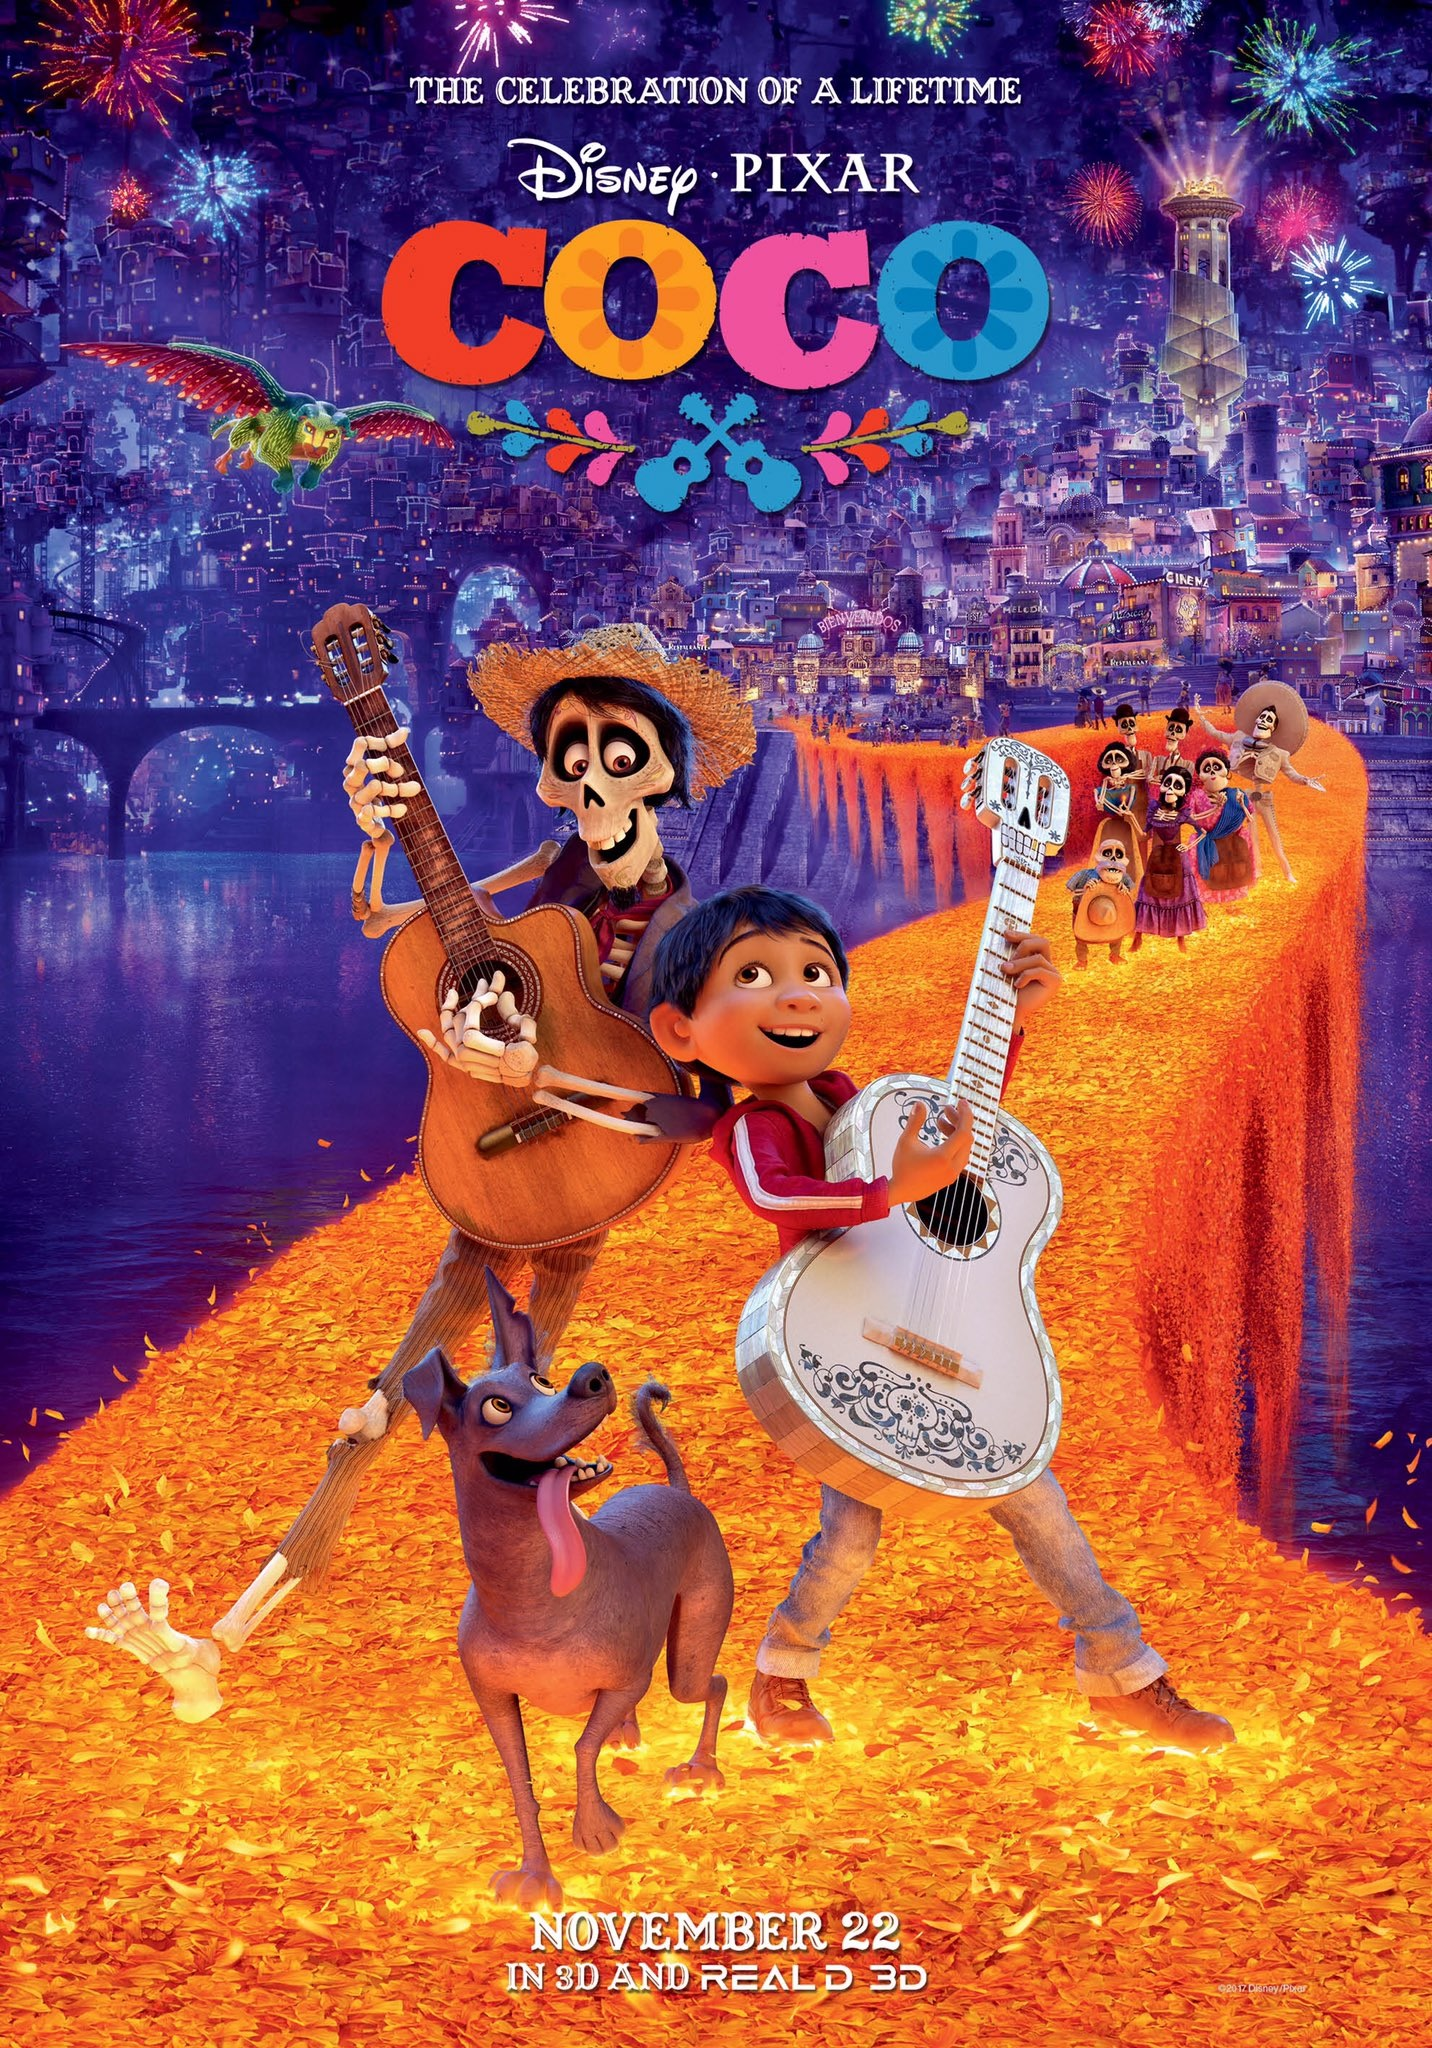 Imagen - Coco 3D poster.jpg   Disney Wiki   FANDOM powered ...